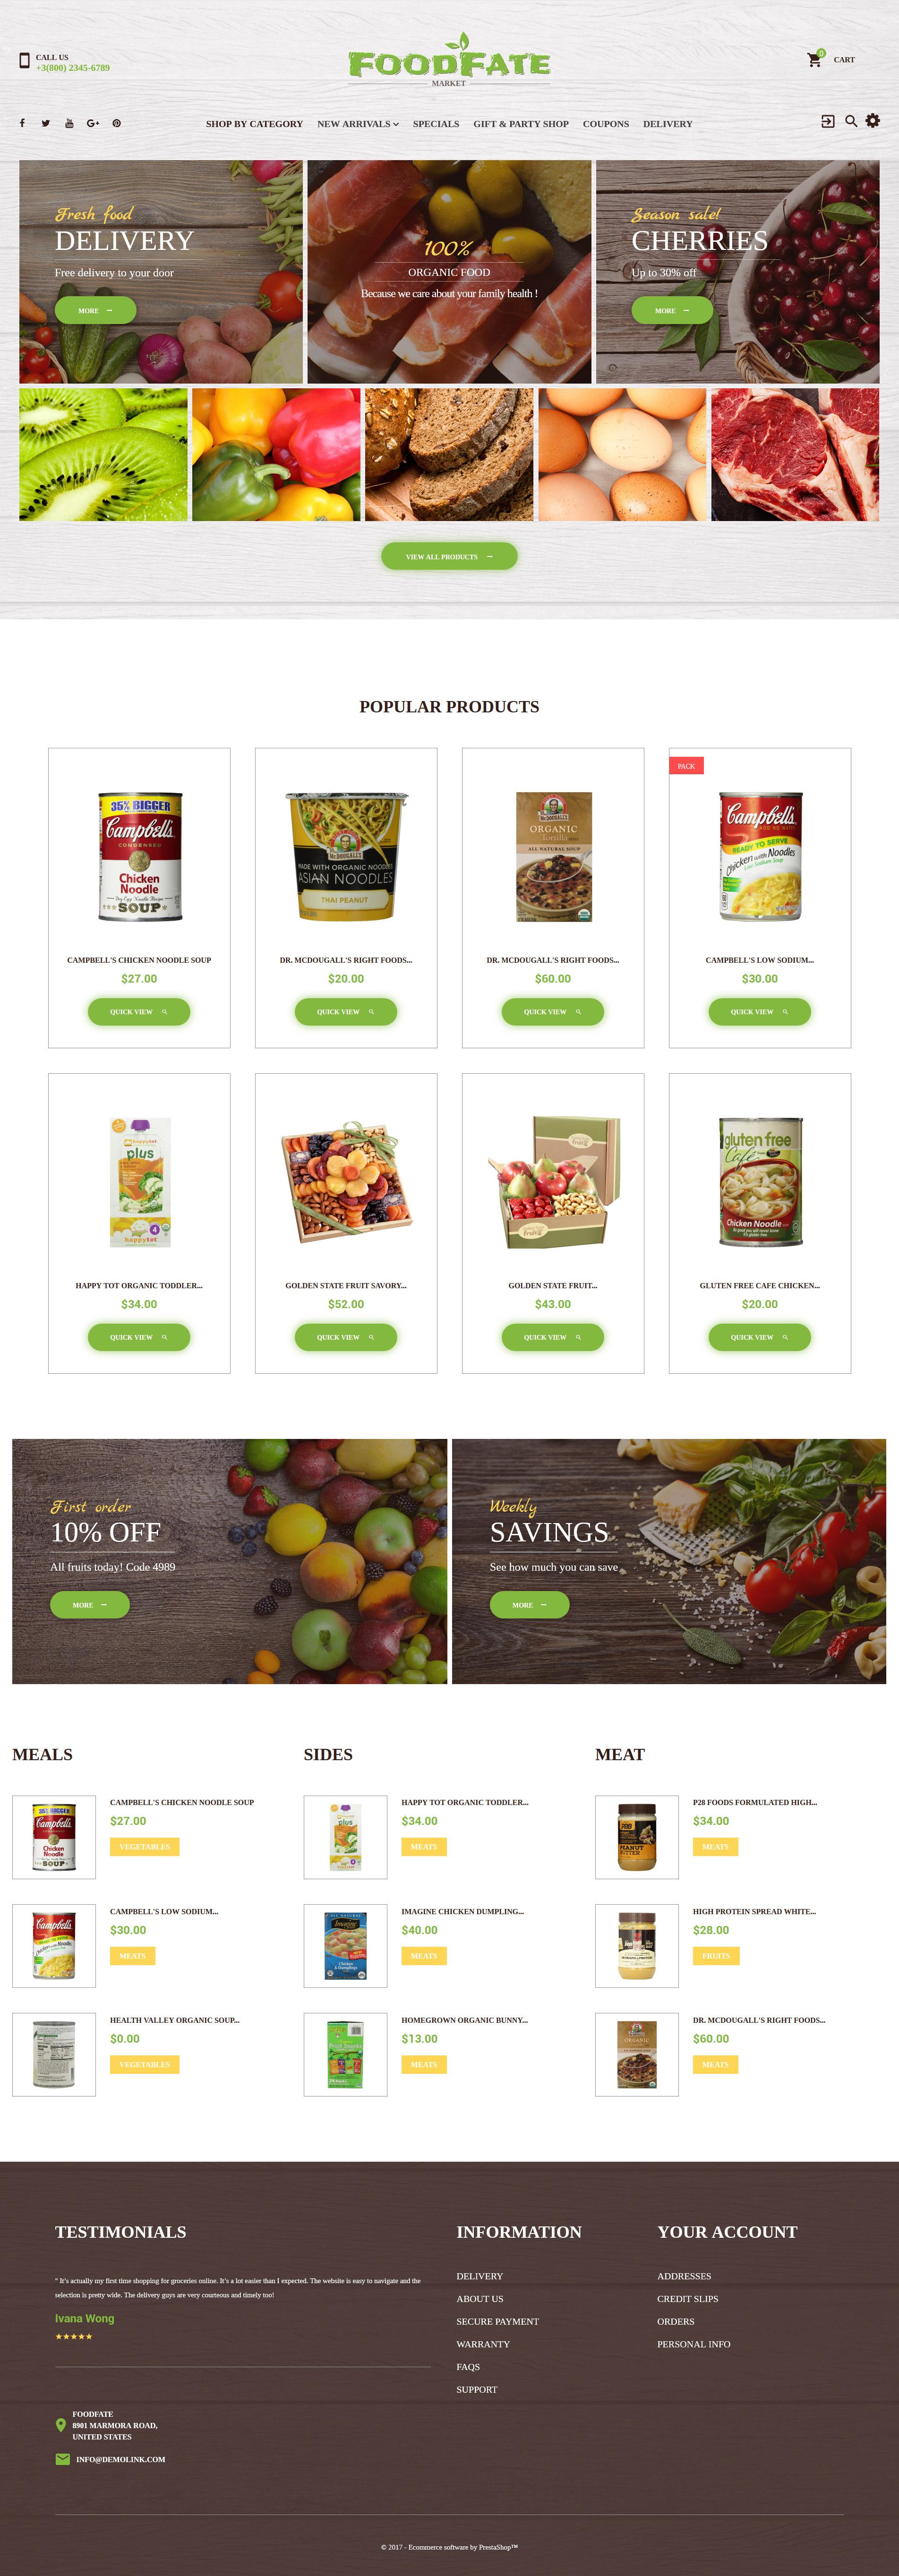 FoodFate - Supermarket PrestaShop Theme - screenshot